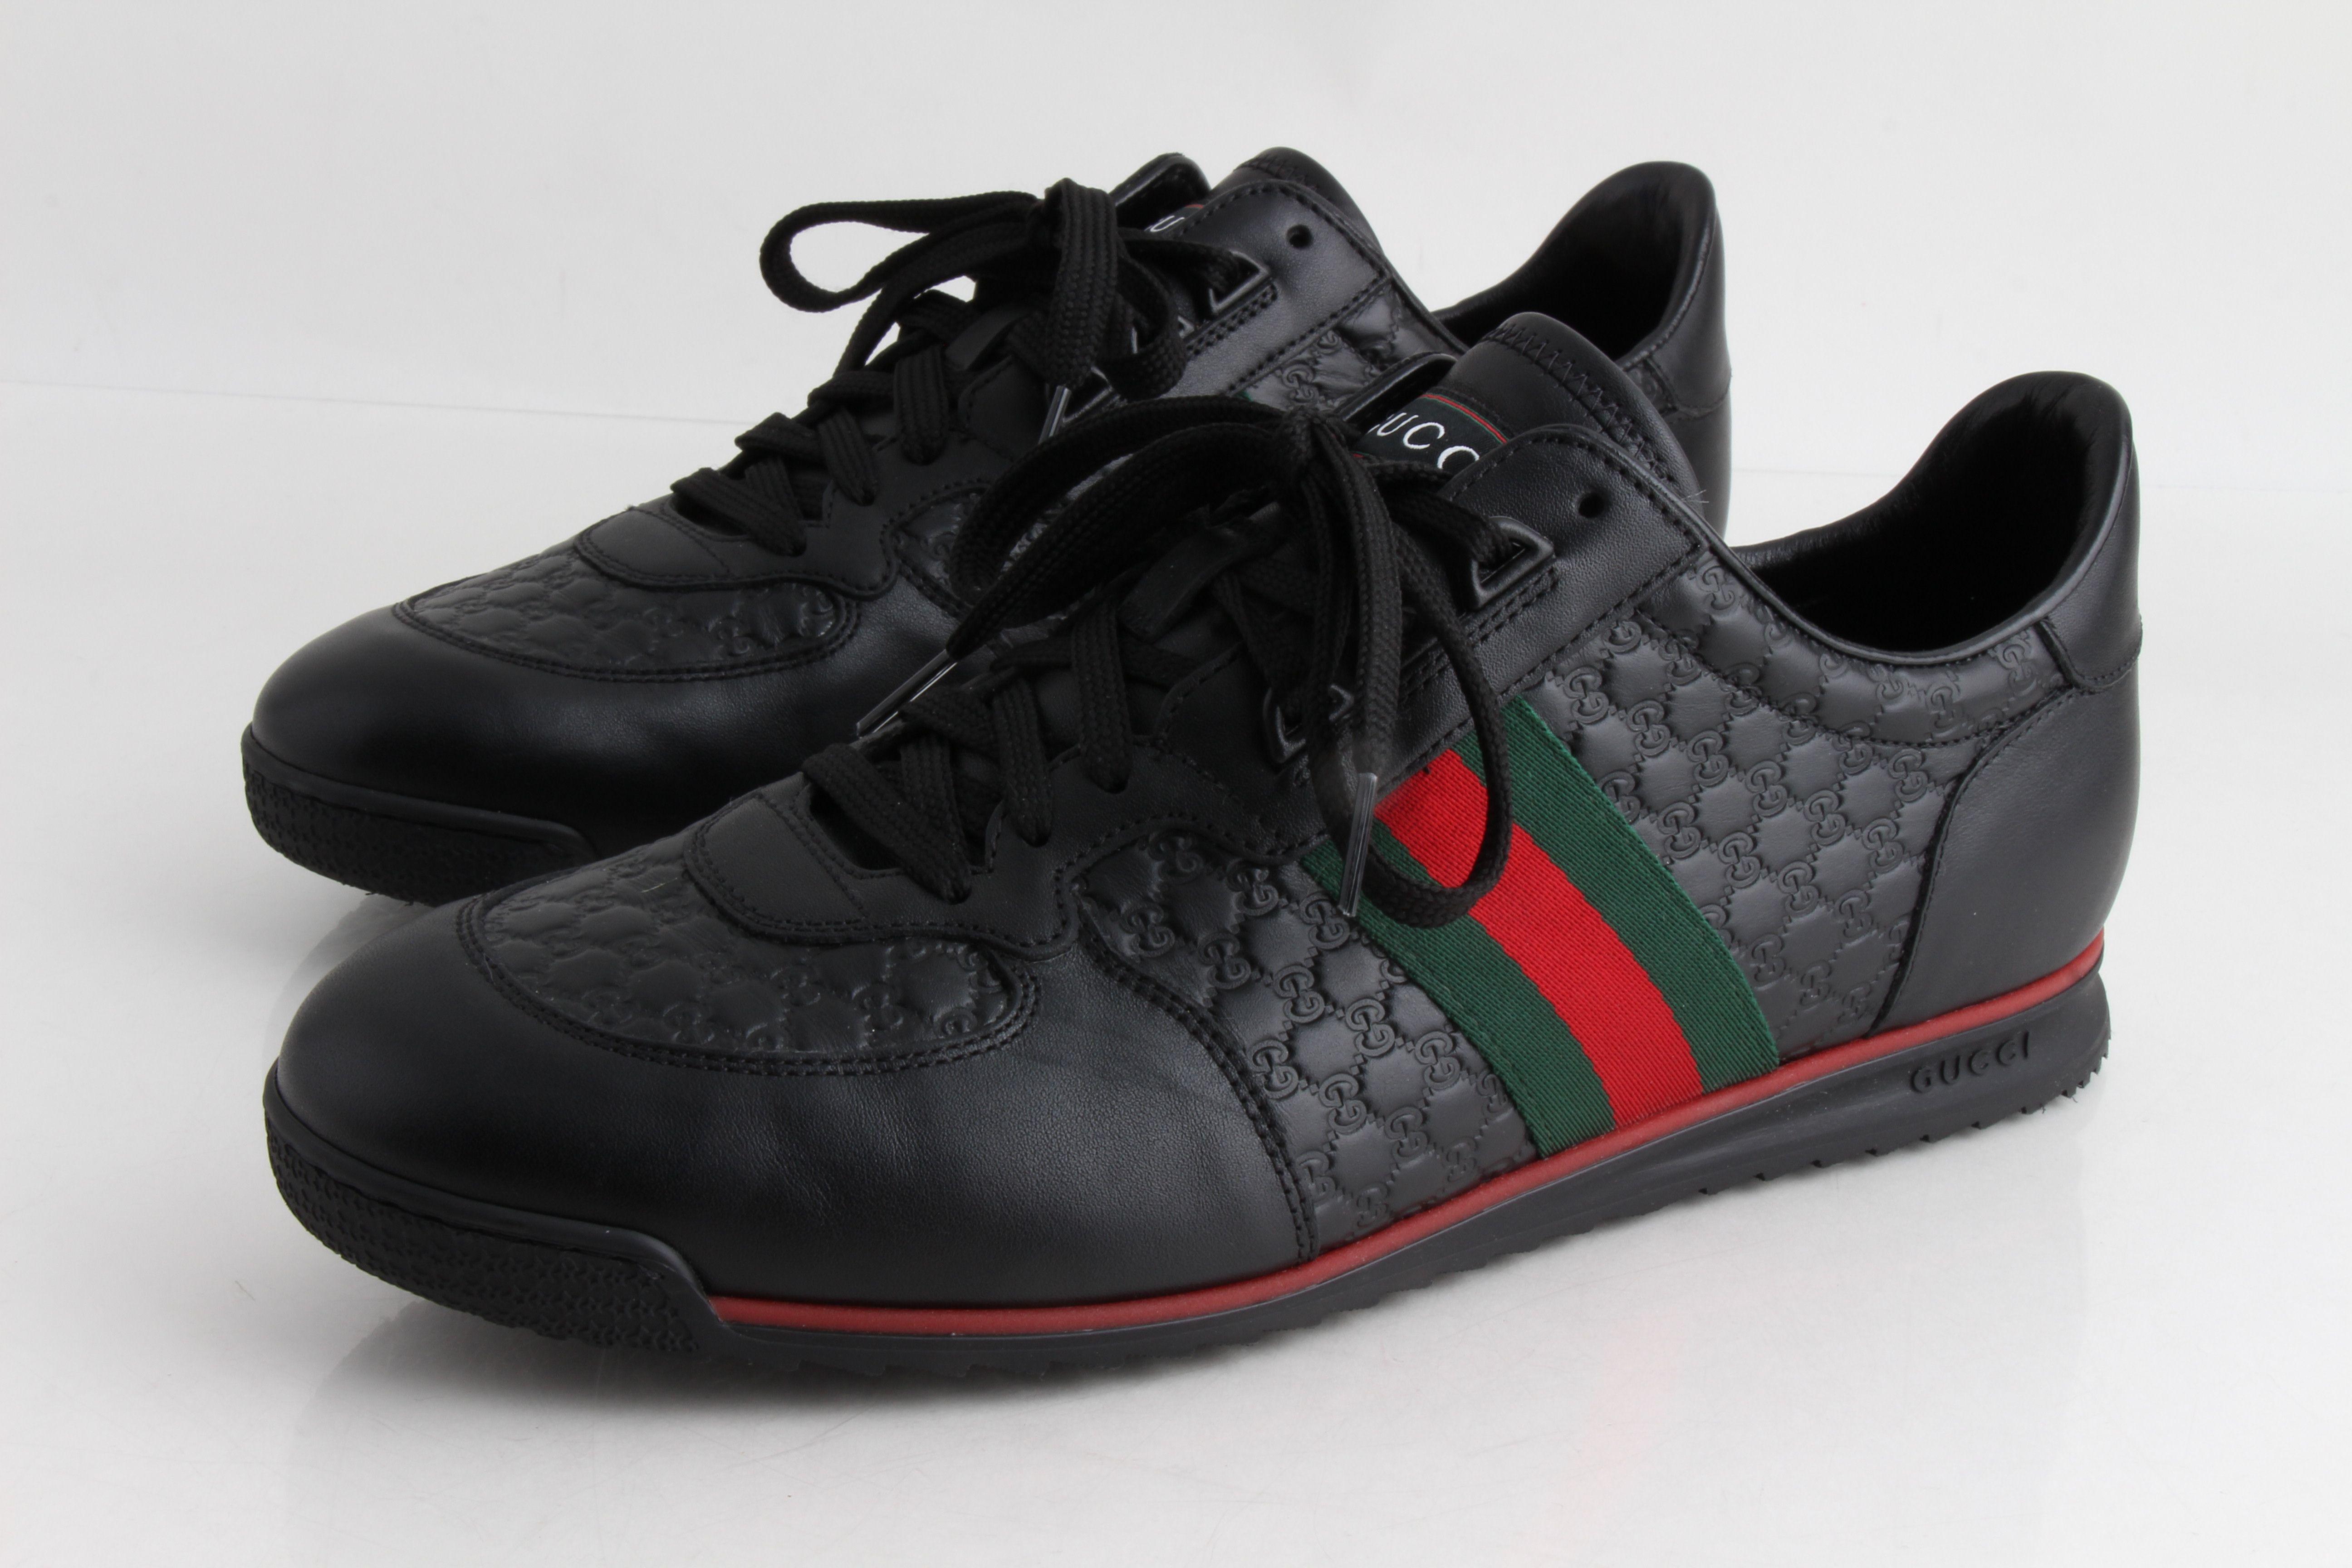 Black Guccisima Leather Sneaker | LePrix